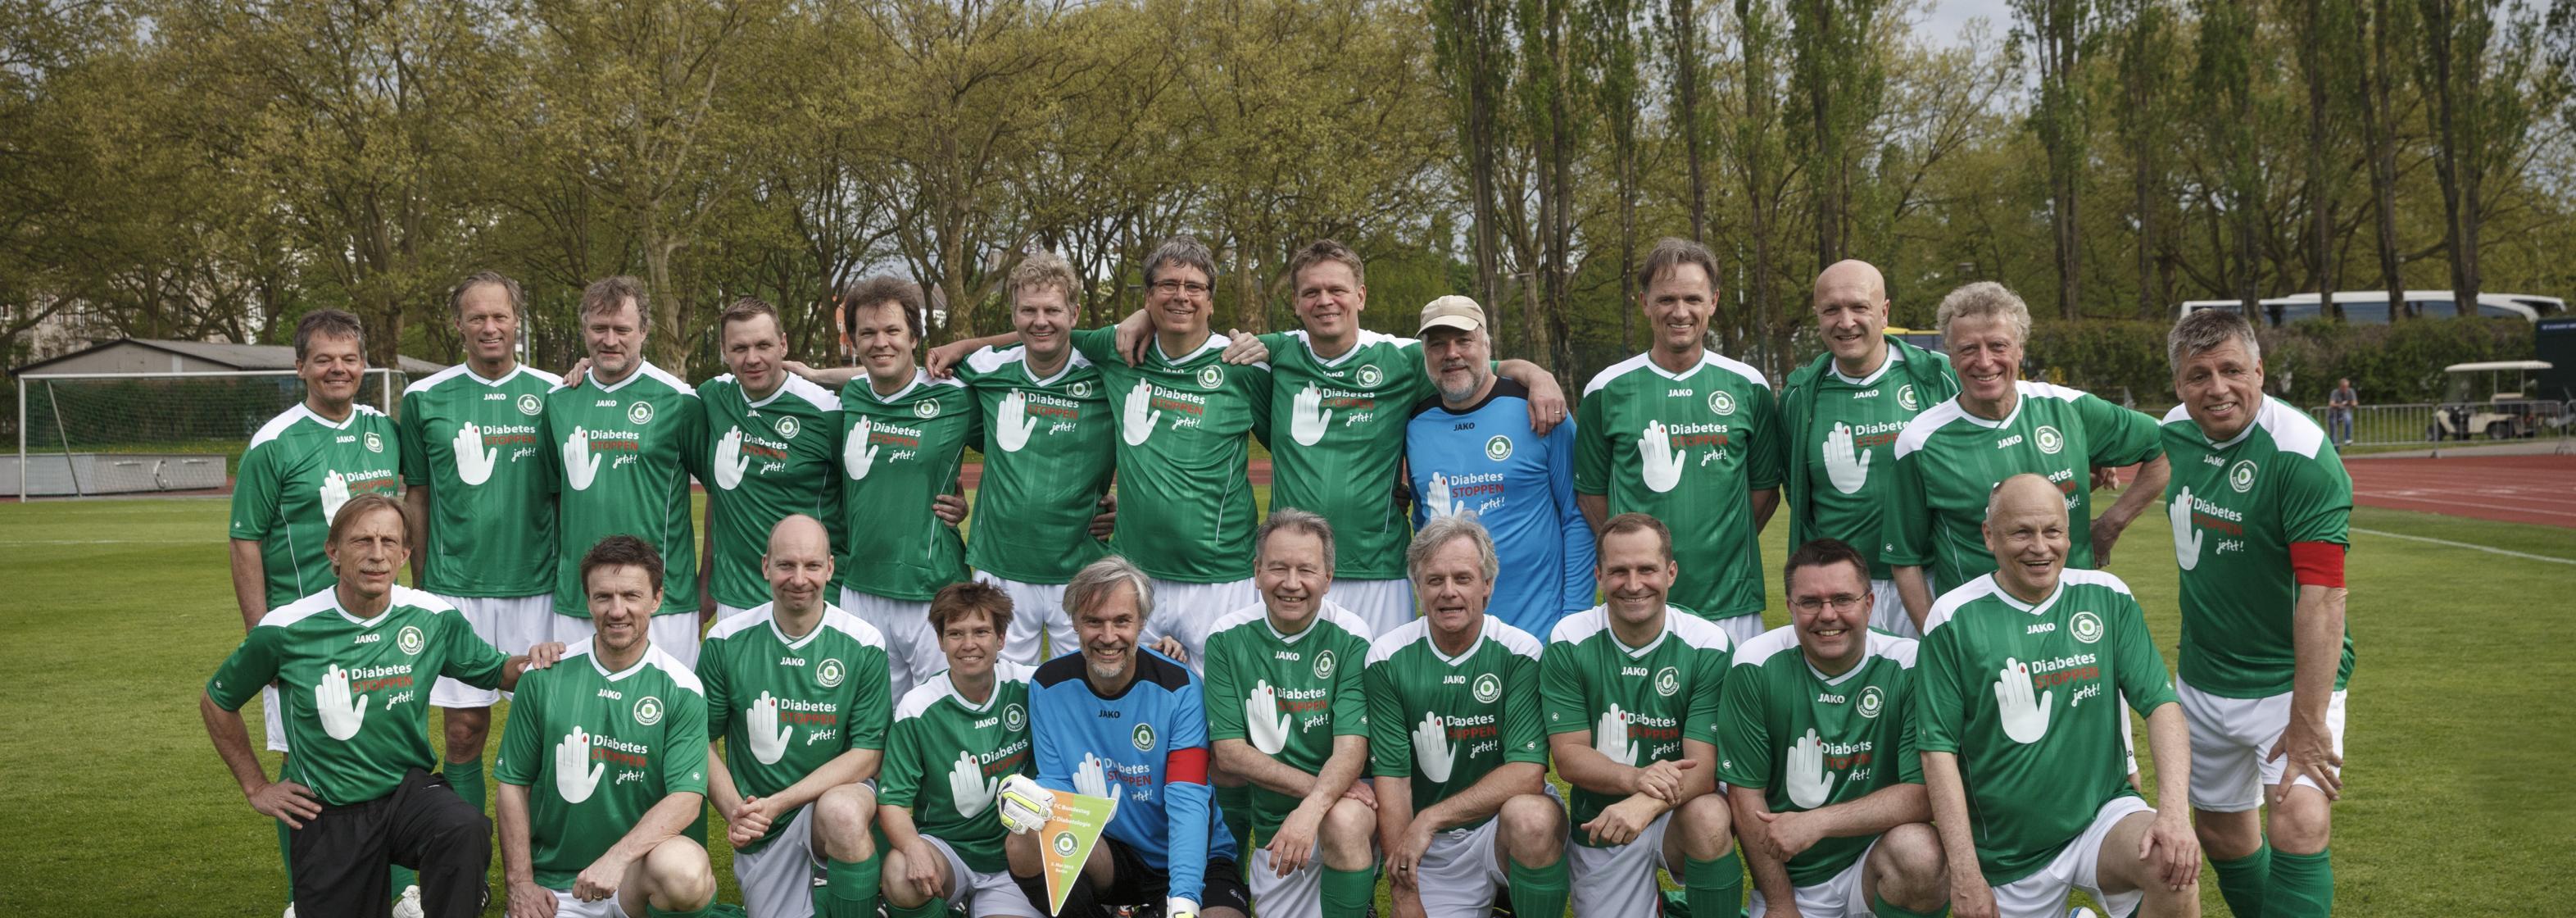 Benefiz Spiel 2015, FC Diabetologie Mannschaft